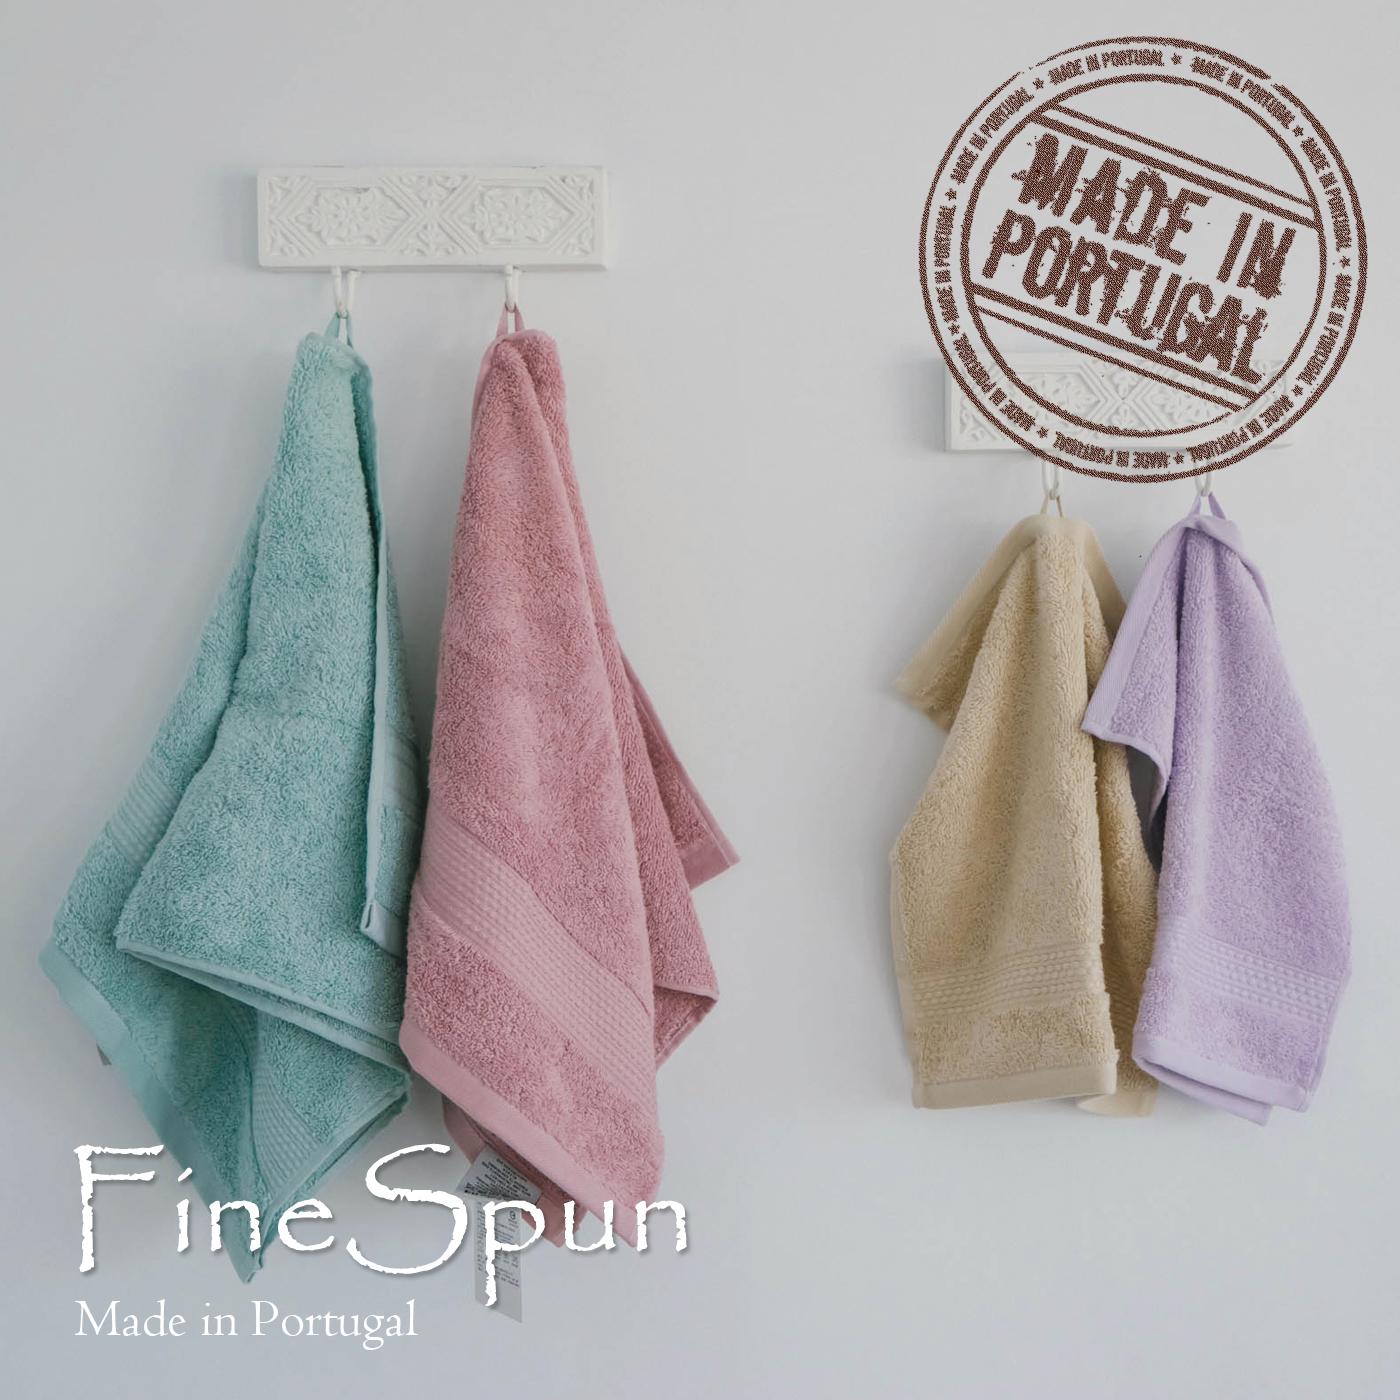 RENKLI 方巾【五色】FINESPUN蓬鬆精紡紗;33X33CM;葡萄牙進口代理;翔仔居家